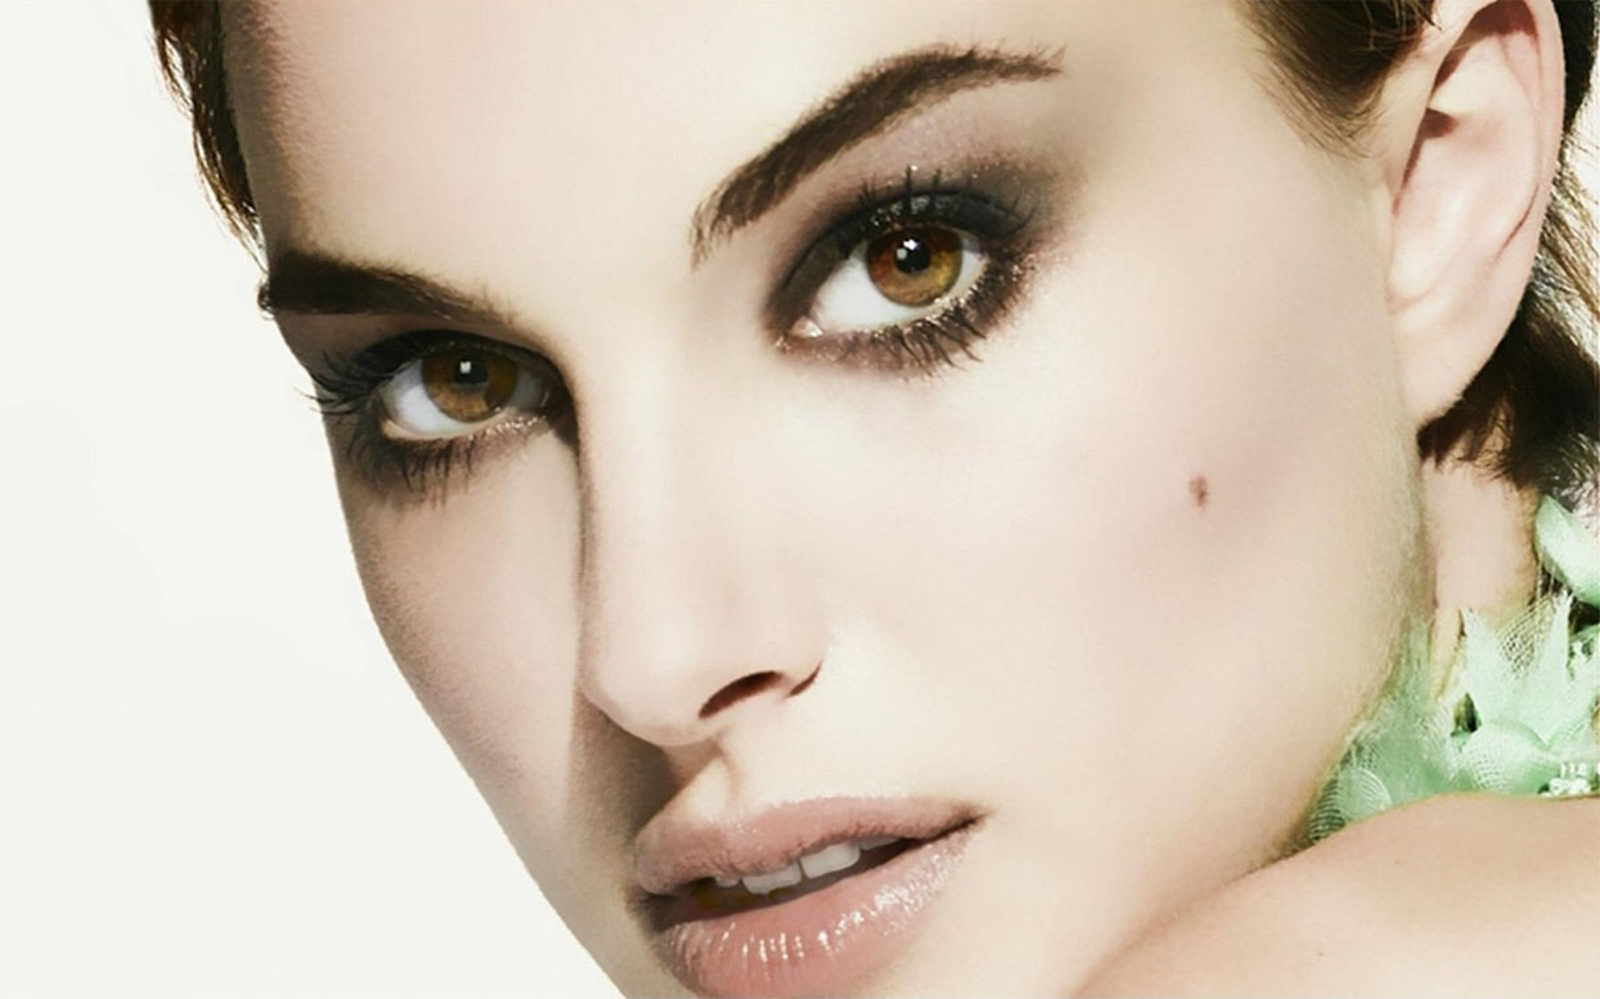 Natalie Portman Rap (Uncensored) - YouTube